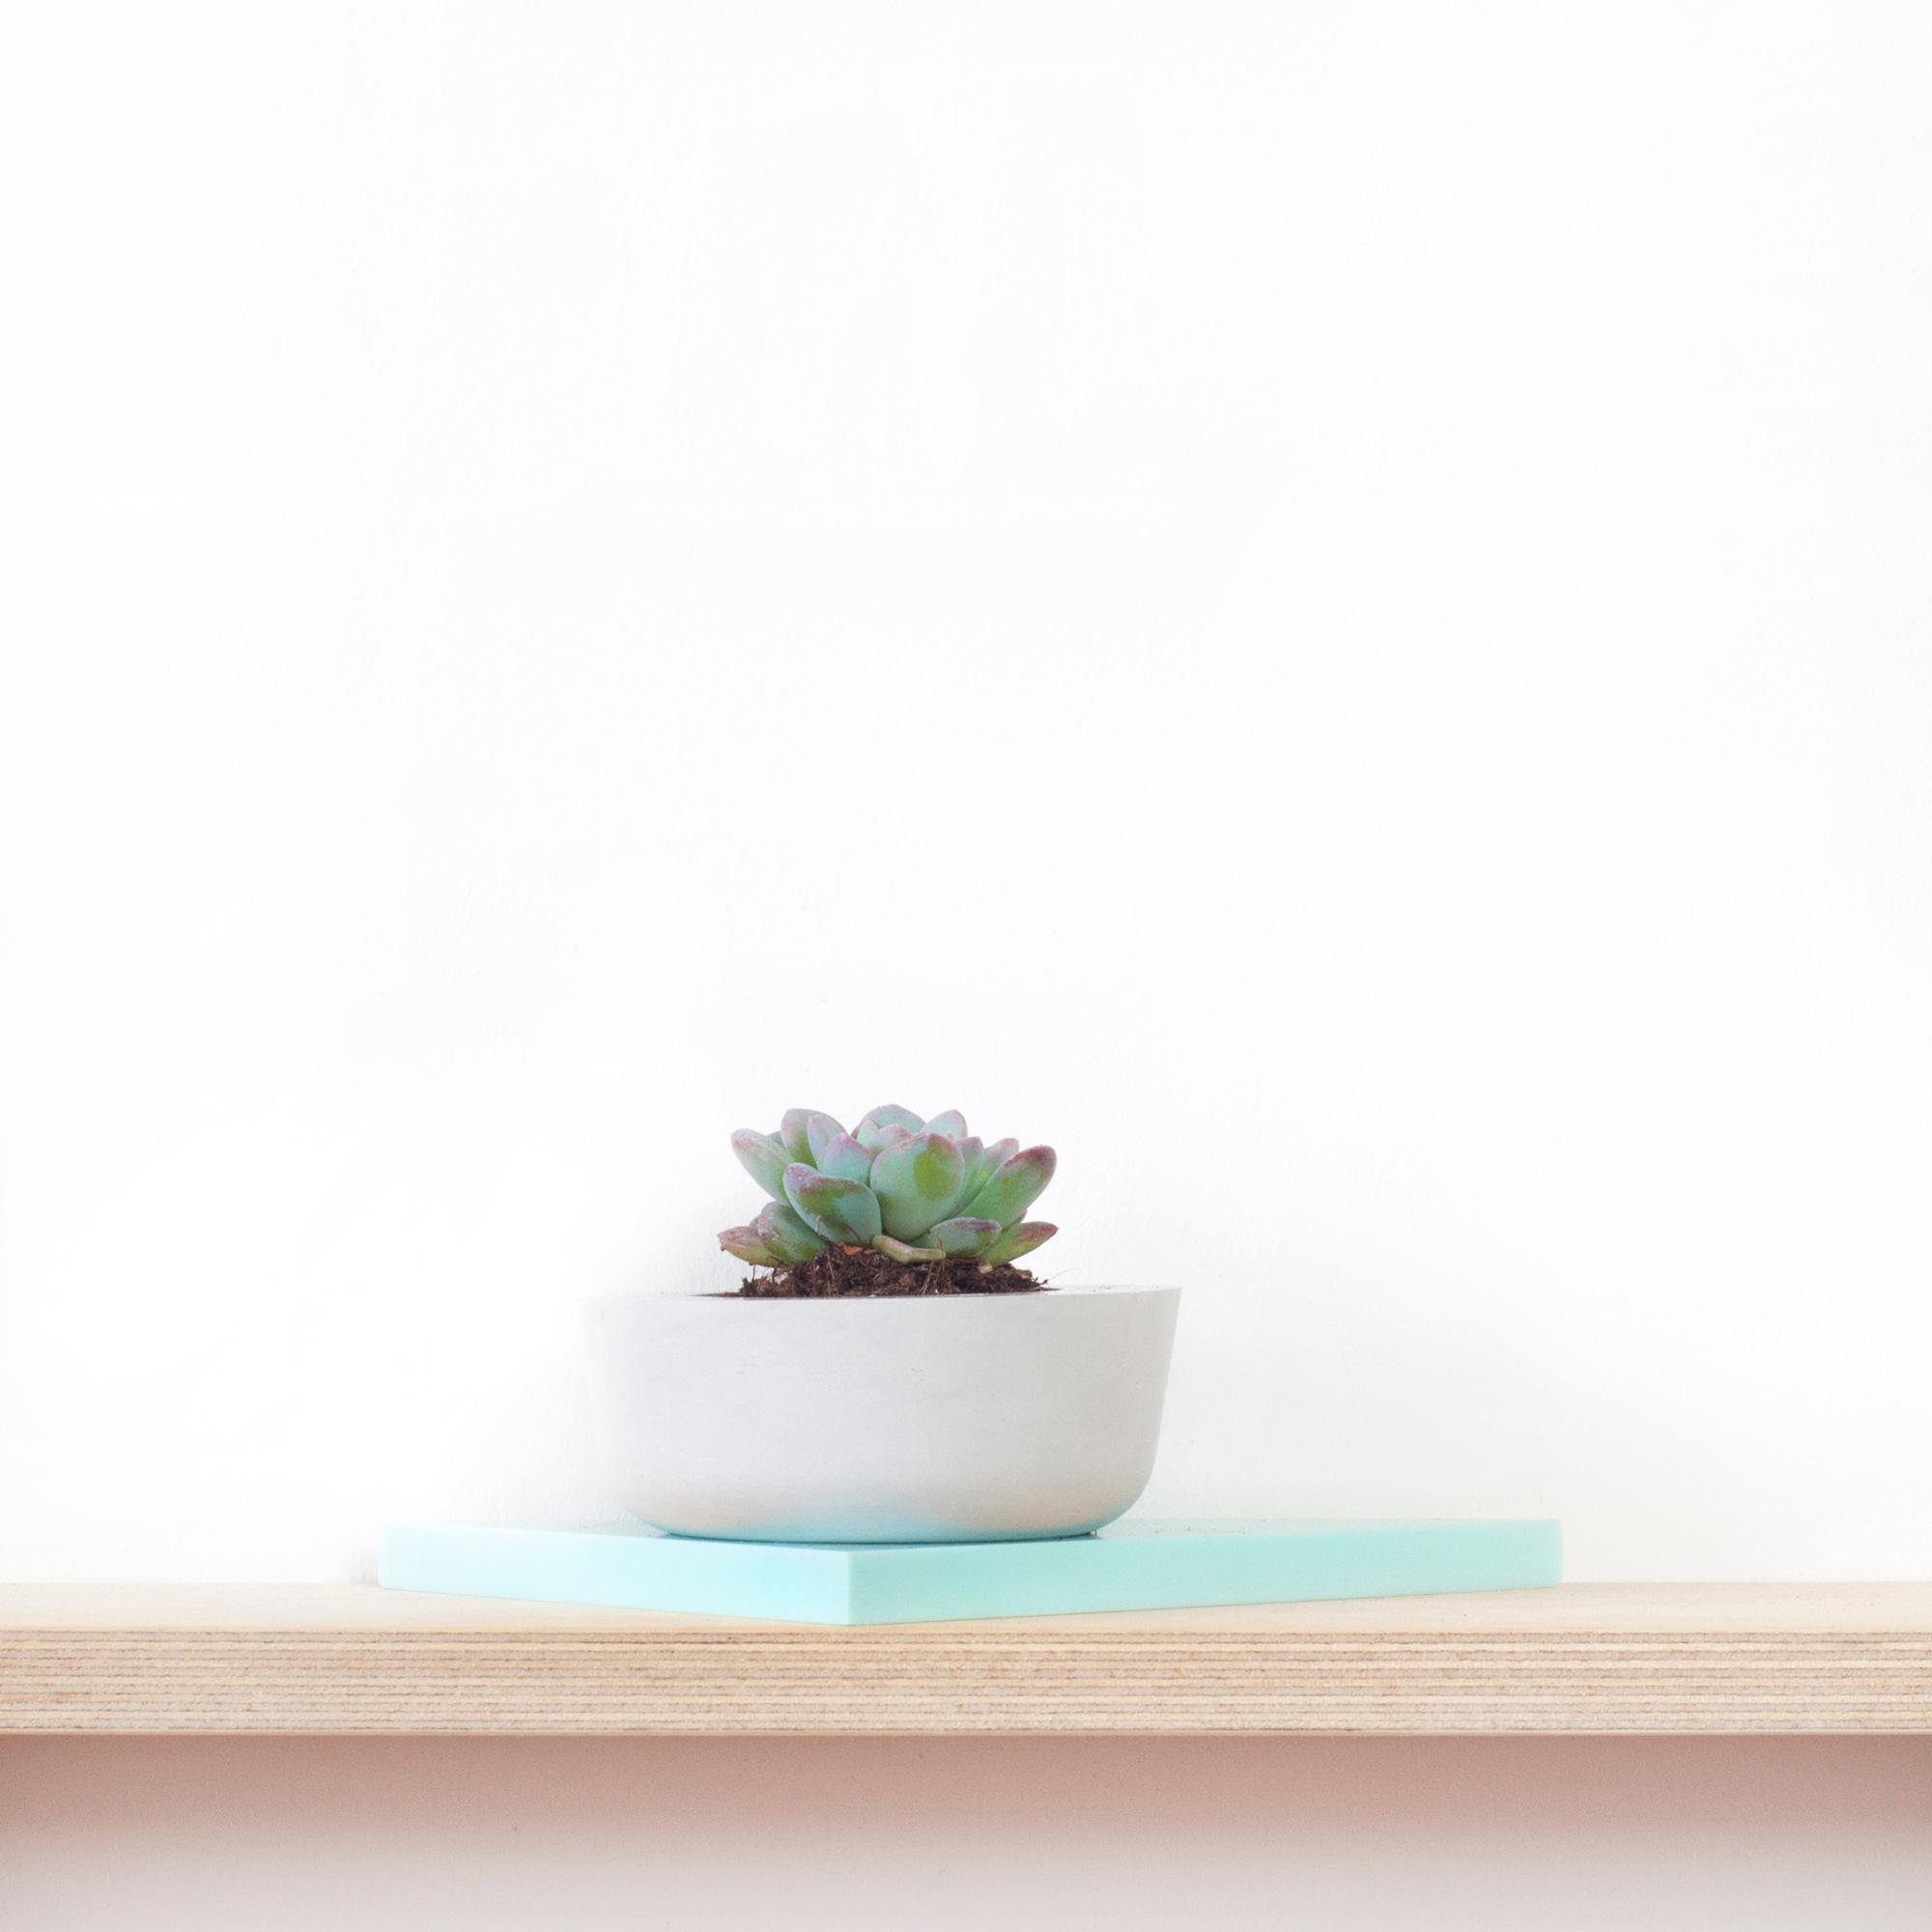 11-plantpot-onewemadeearlier-web.jpg